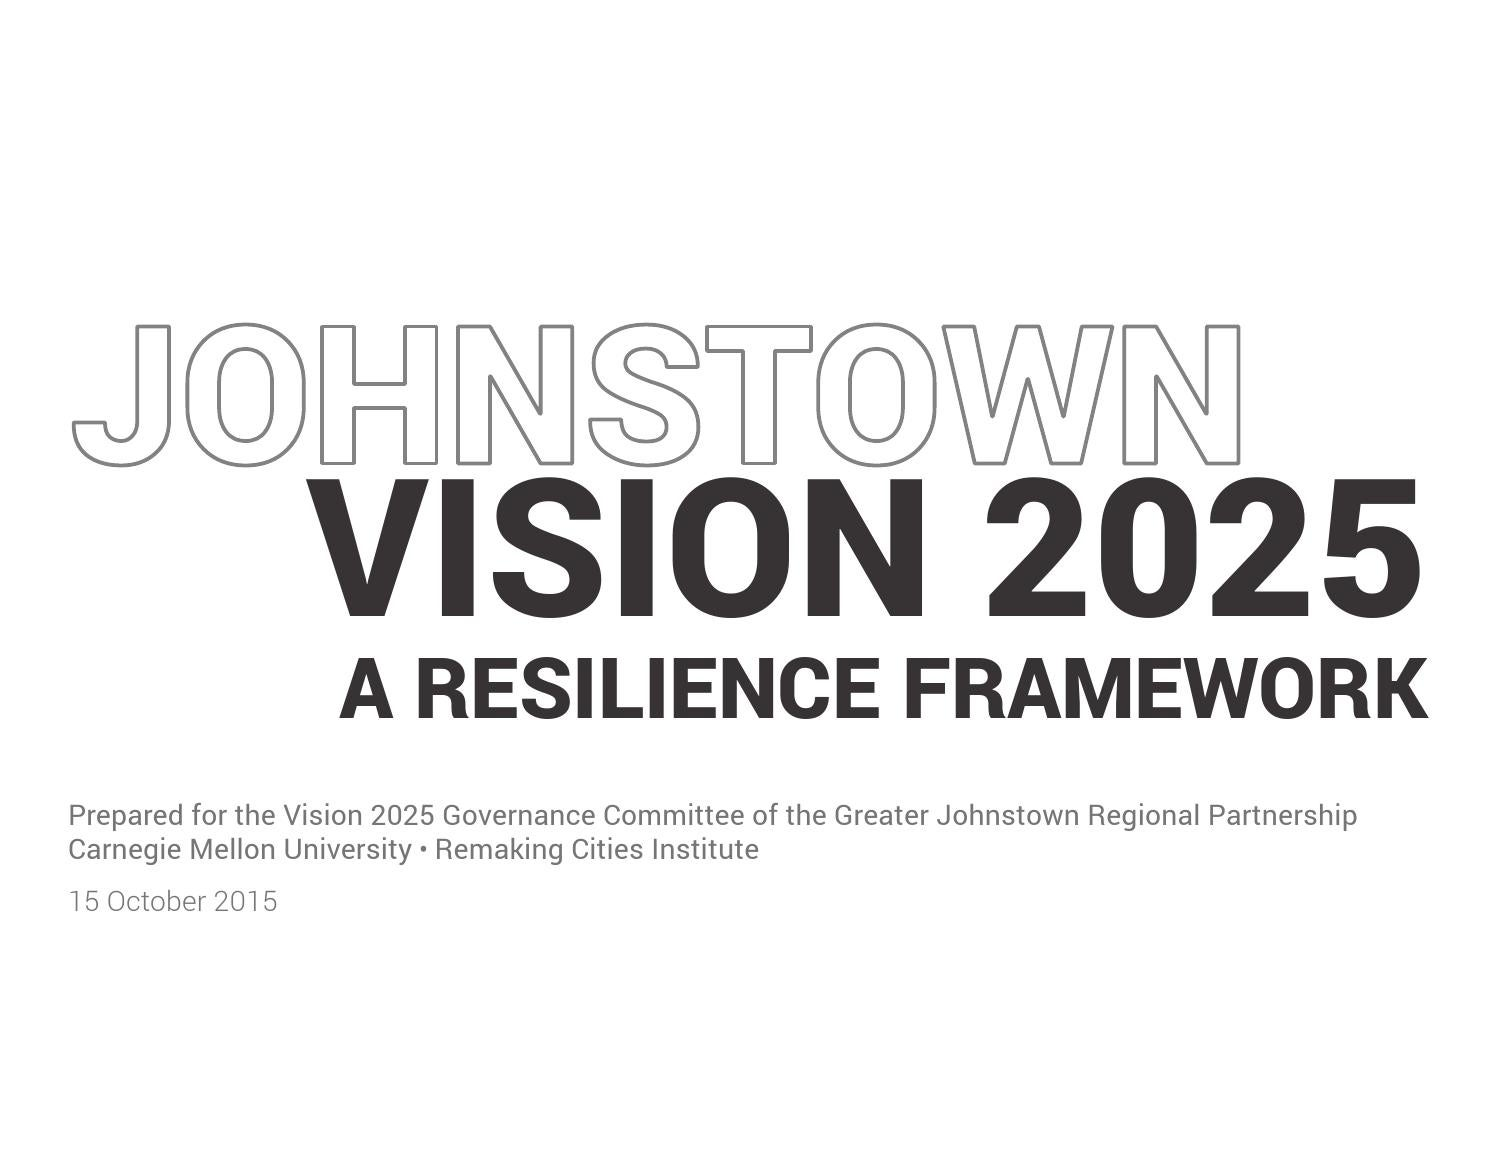 Johnstown Vision 2025 Strategic Vision by Angie Berzonski